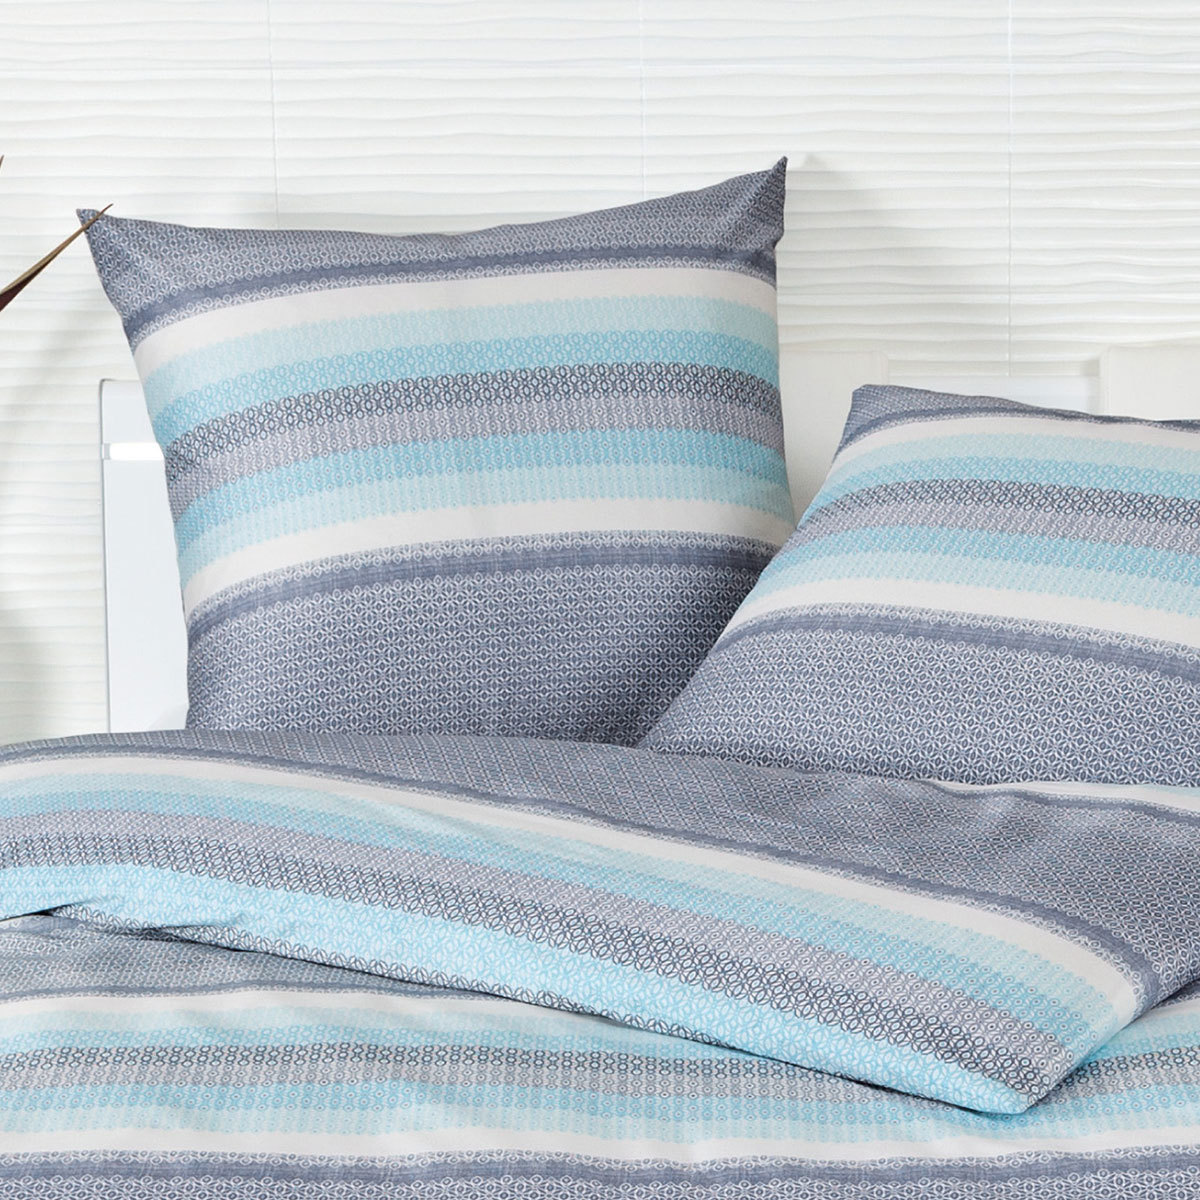 janine mako satin bettw sche moments 98024 02 g nstig online kaufen bei bettwaren shop. Black Bedroom Furniture Sets. Home Design Ideas